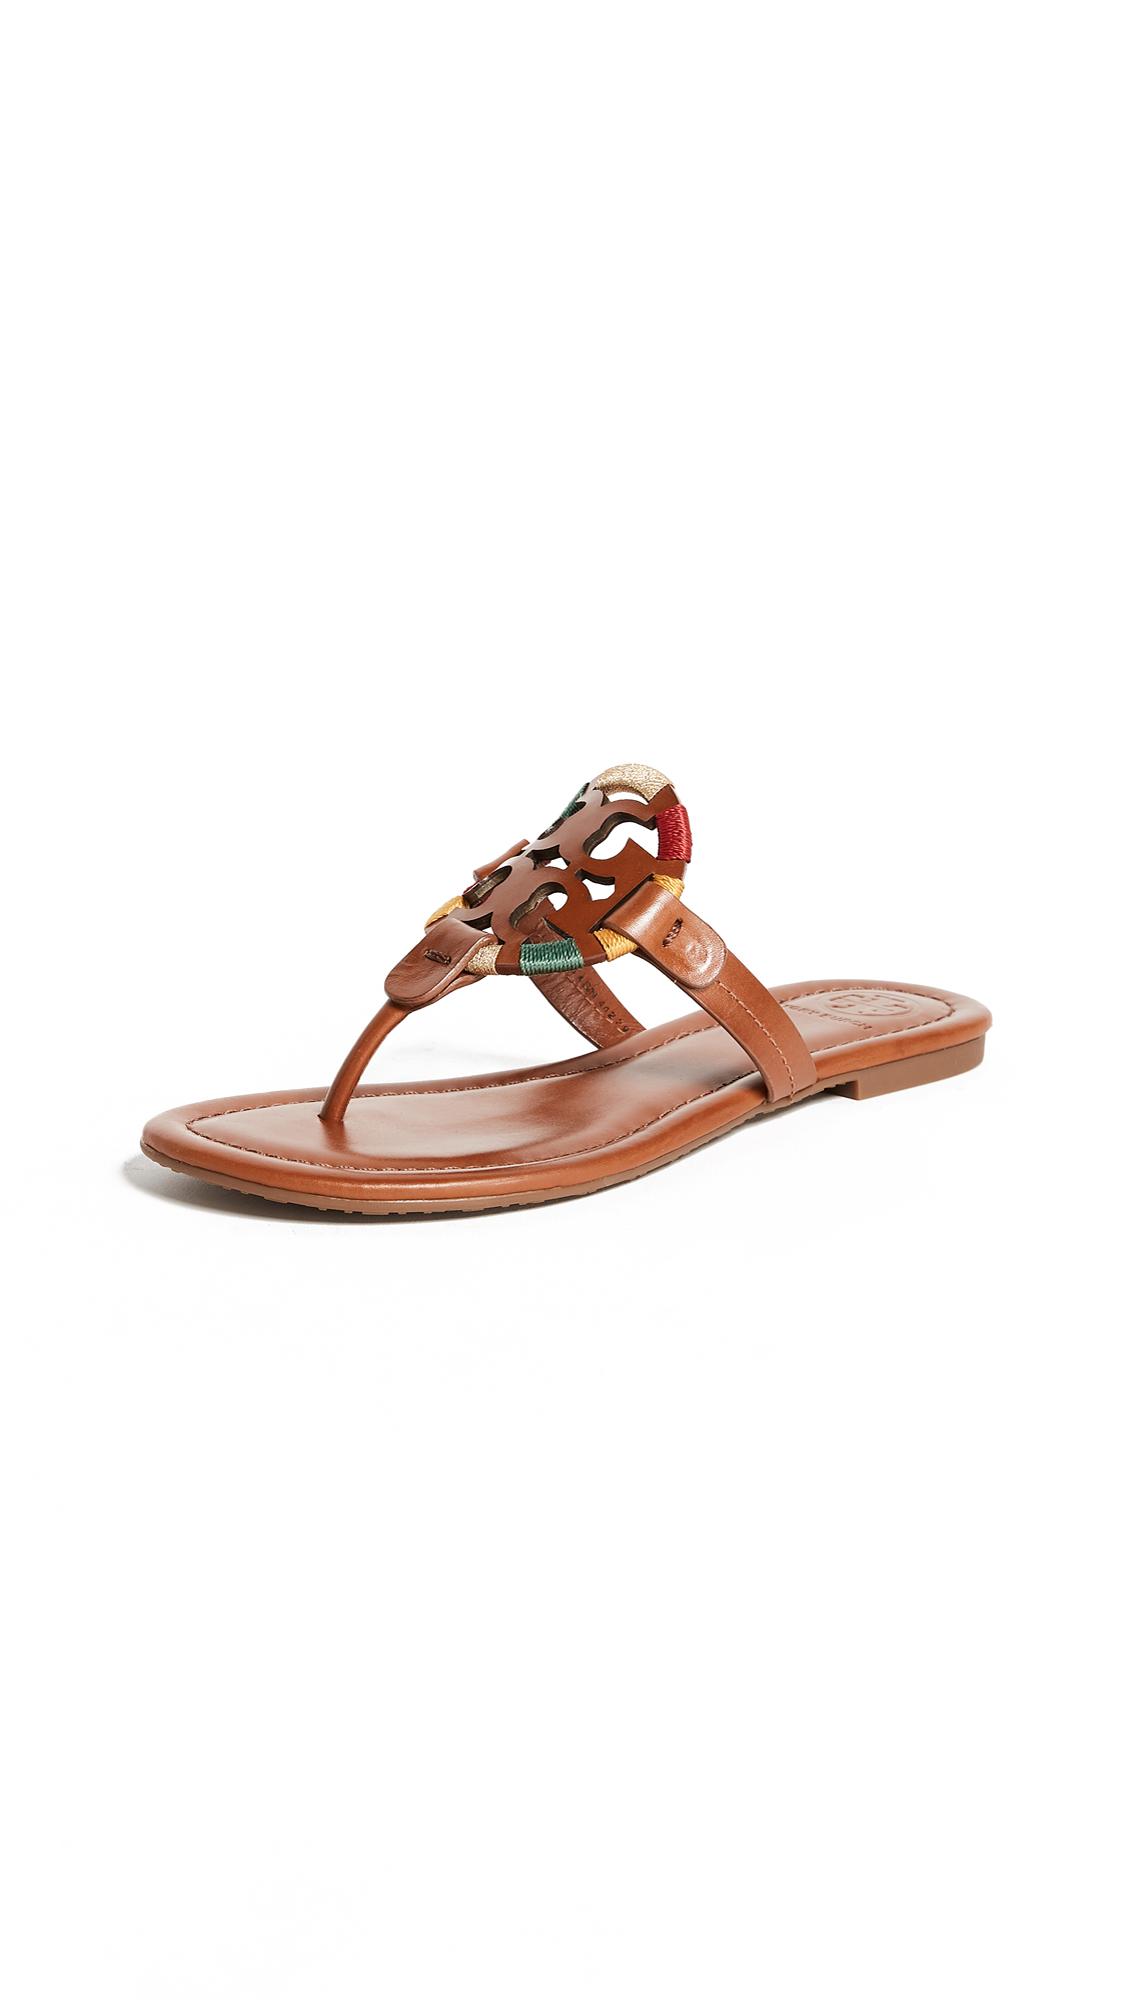 Tory Burch Miller Embroidered Sandals - Vintage Vachetta/Multi